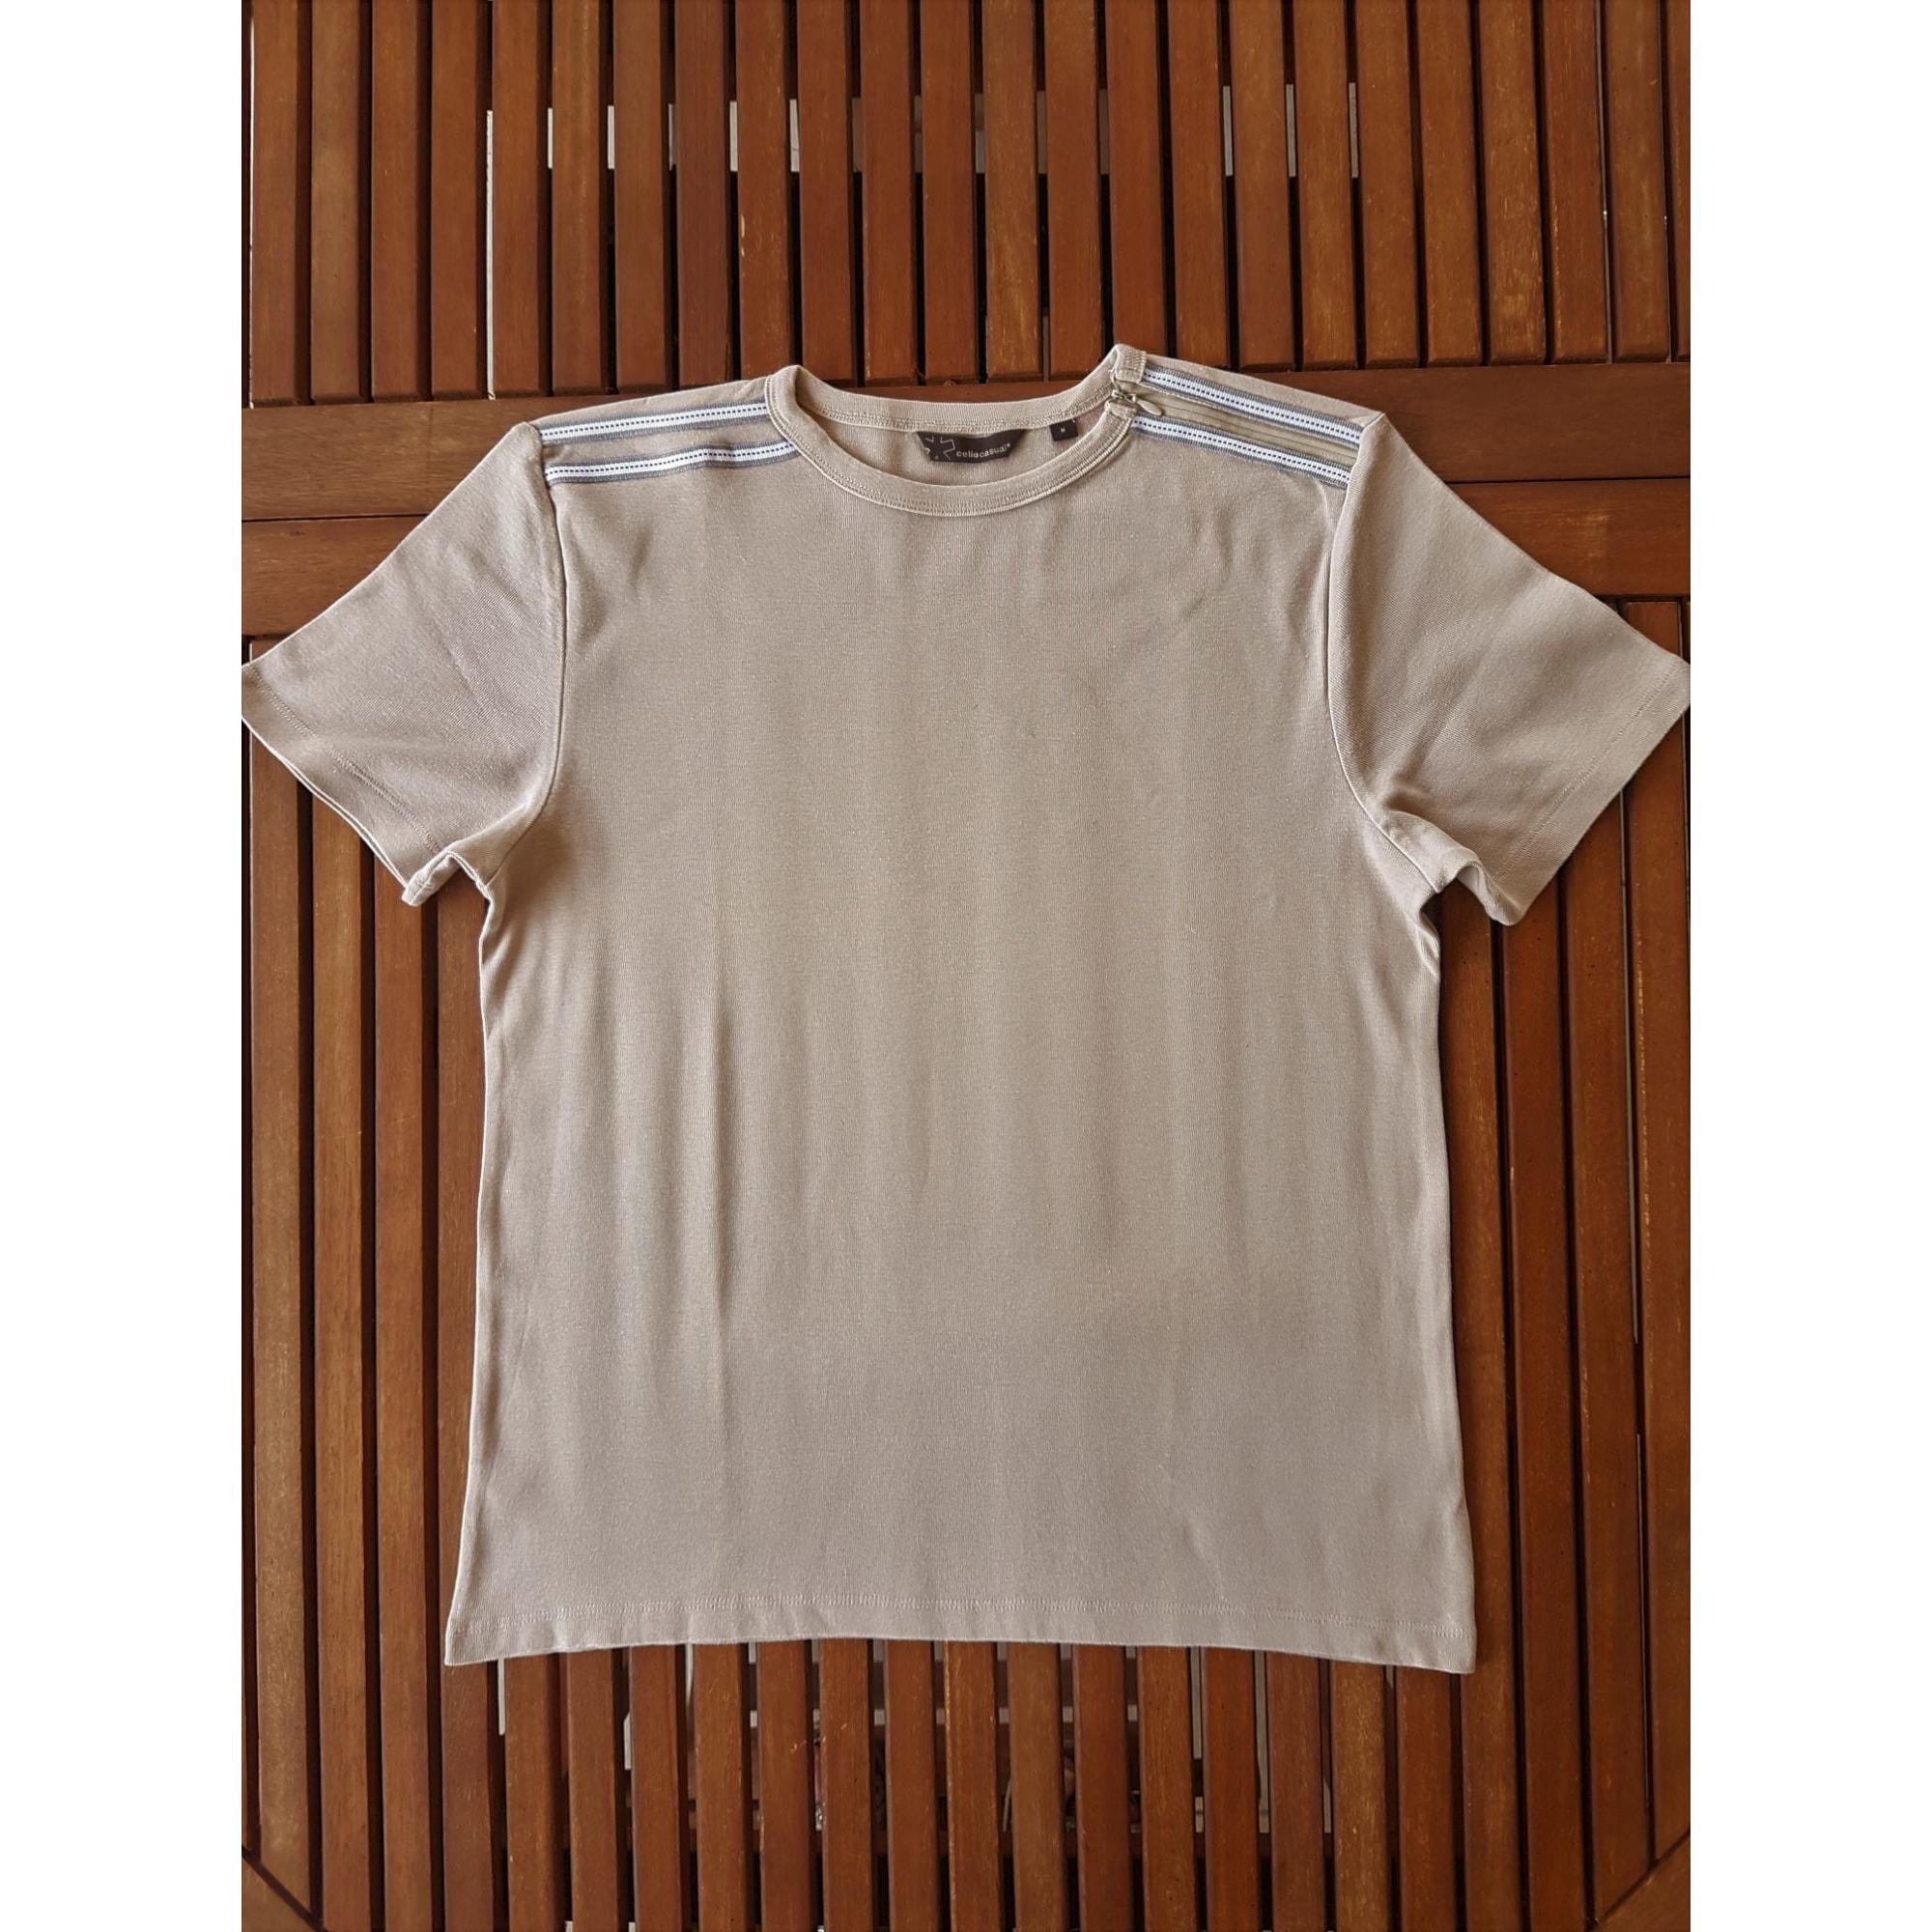 T-shirt CELIO Beige, camel